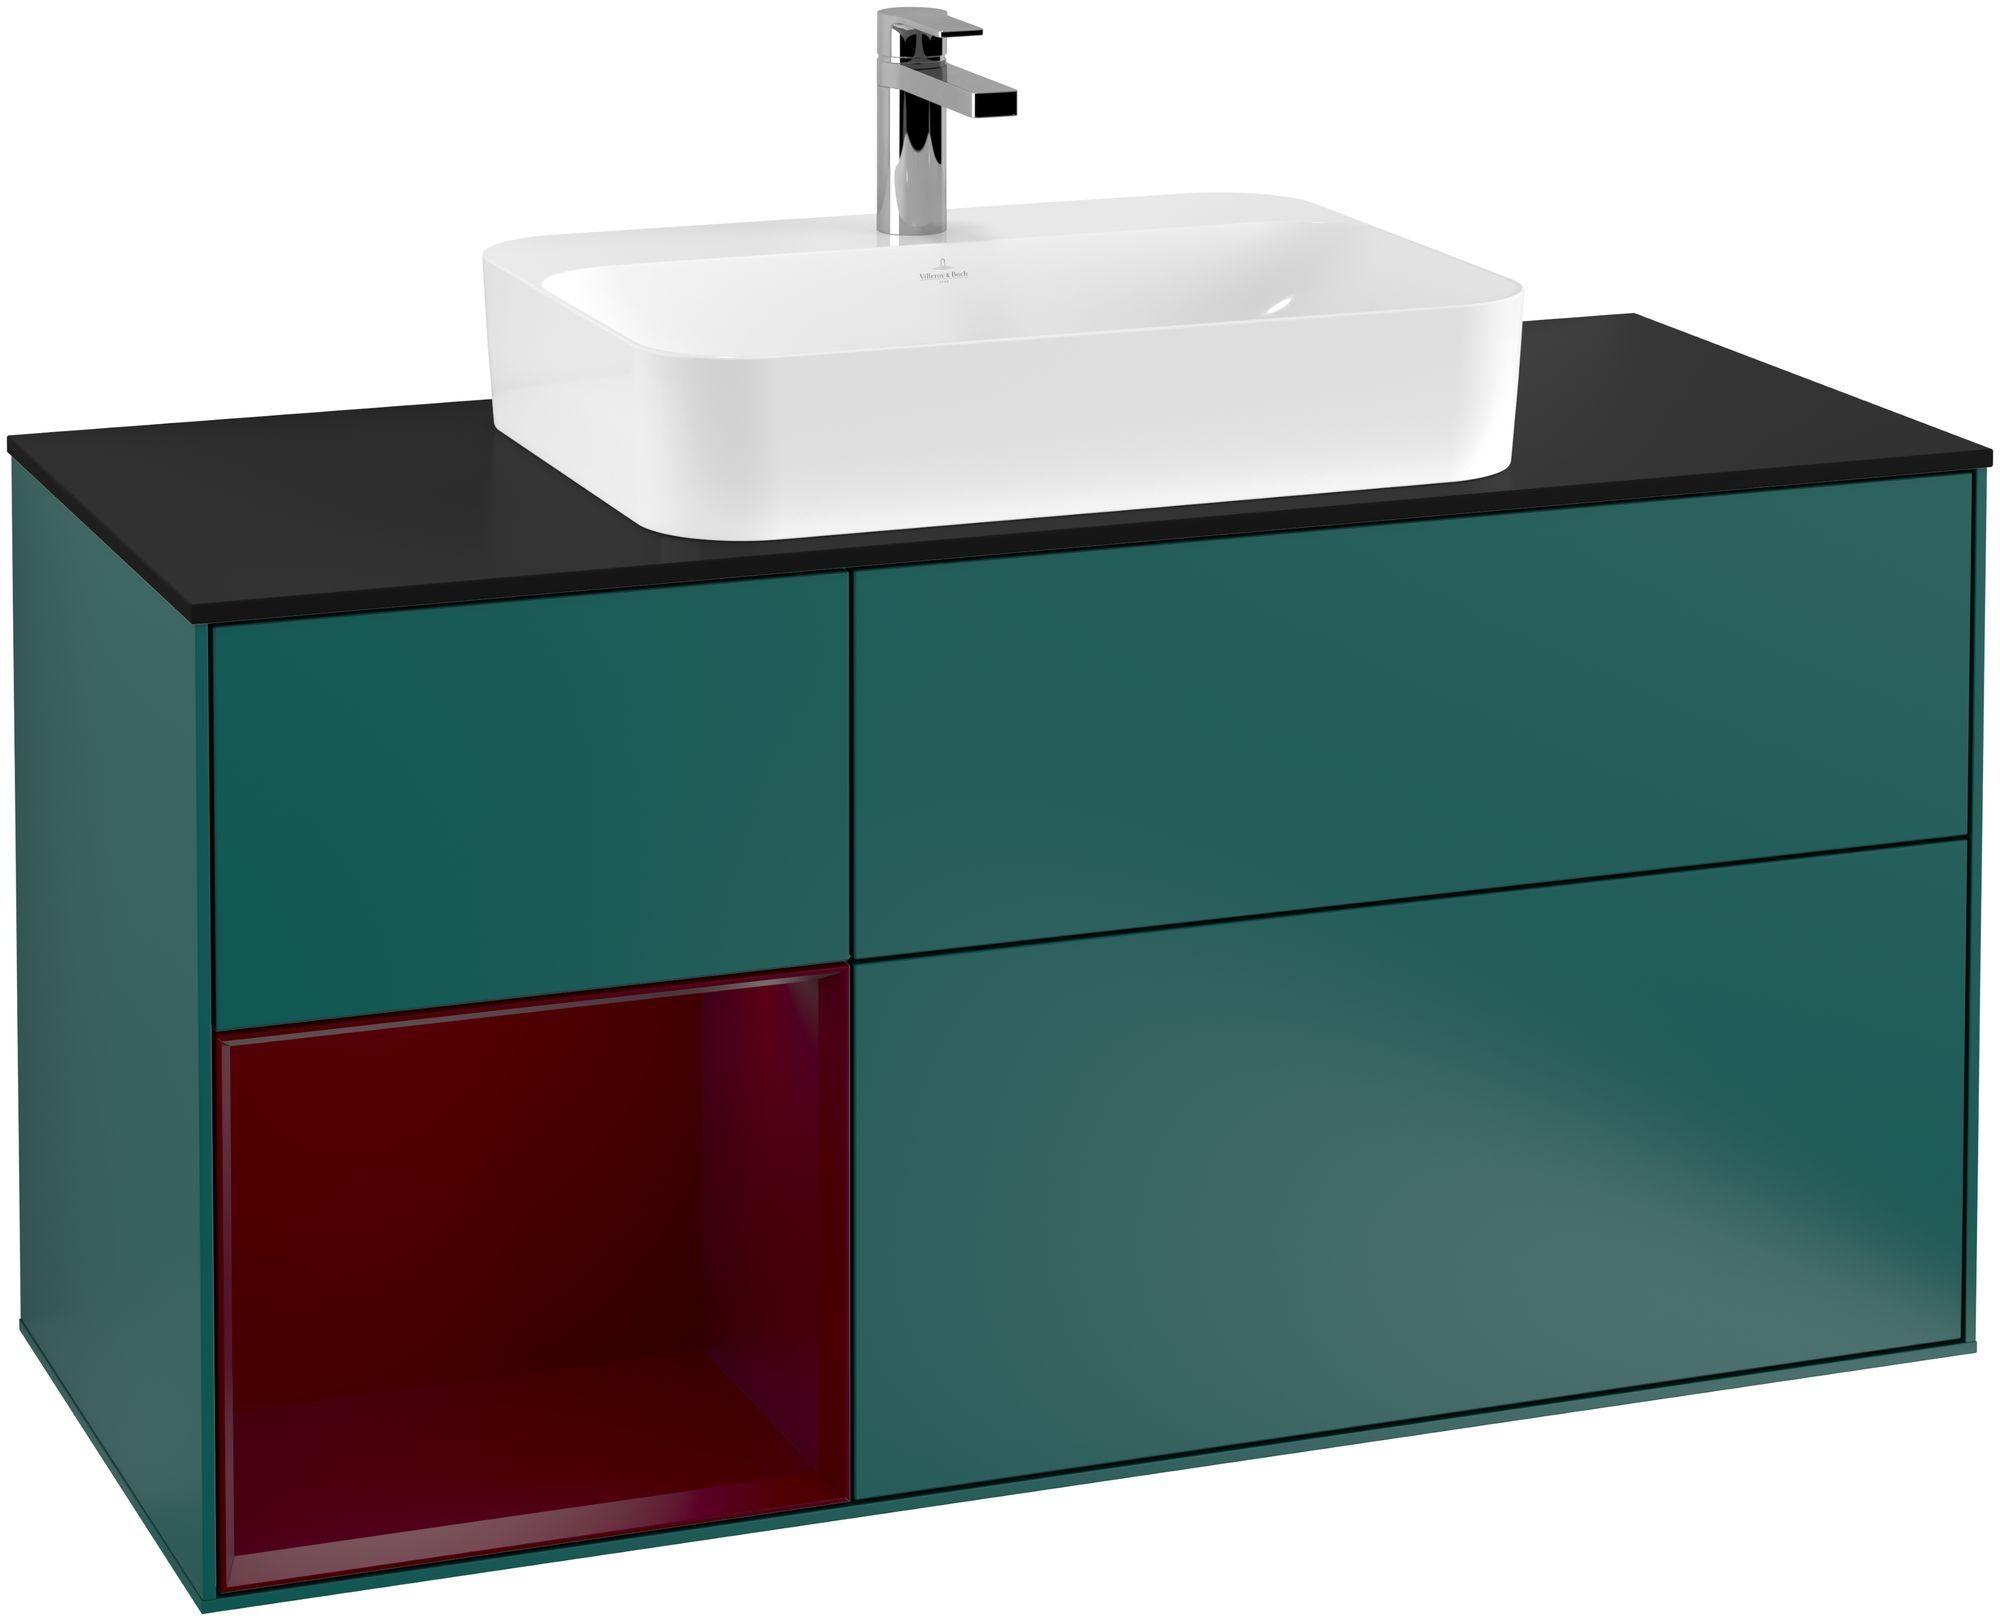 Villeroy & Boch Finion F41 Waschtischunterschrank mit Regalelement 3 Auszüge Waschtisch mittig LED-Beleuchtung B:120xH:60,3xT:50,1cm Front, Korpus: Cedar, Regal: Peony, Glasplatte: Black Matt F412HBGS